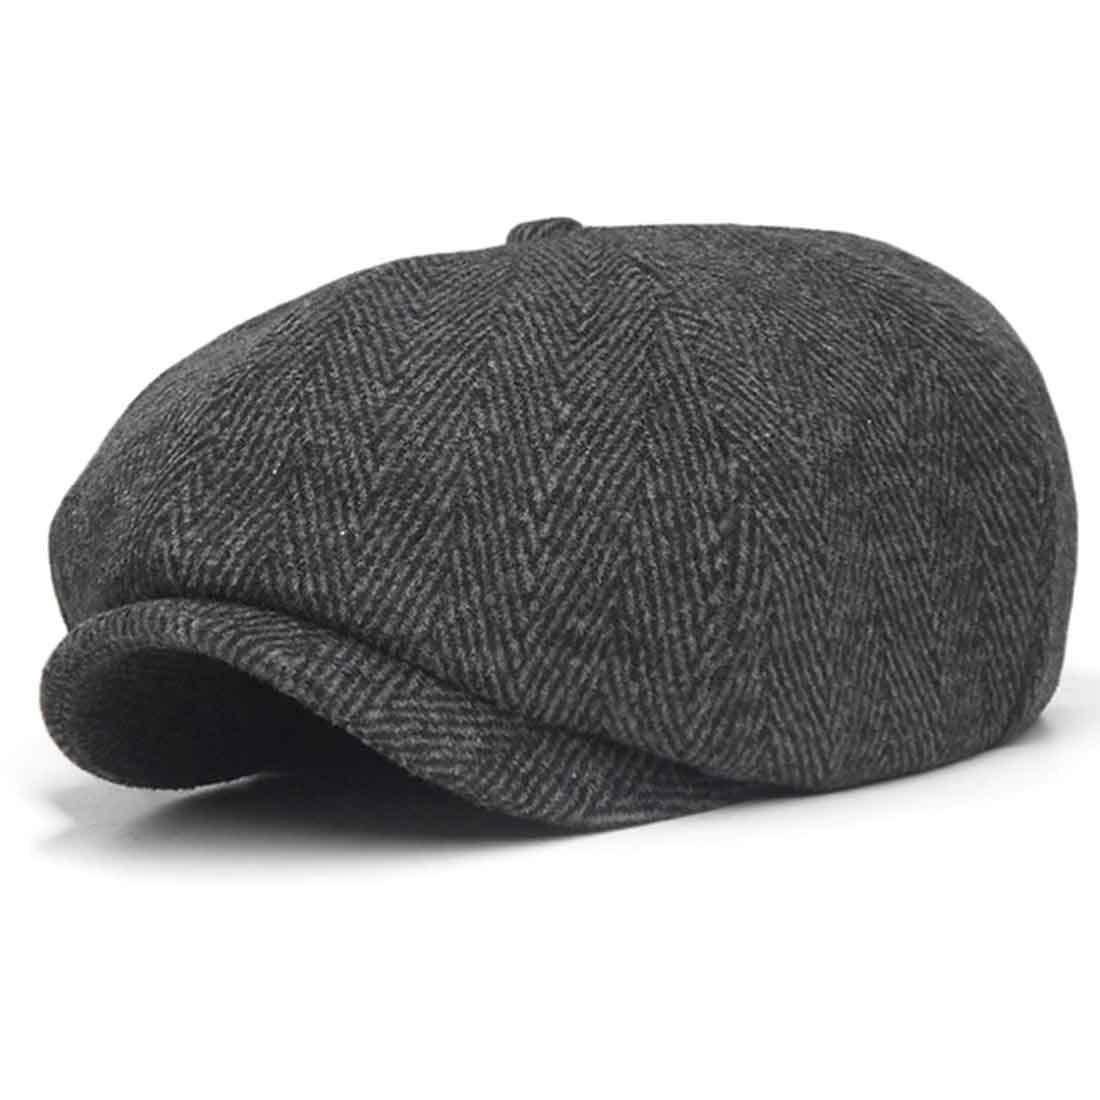 e352c6825 10dare Irish Newsboy Floppy Cap | C5/6 | Herringbone Wool 30 Cap